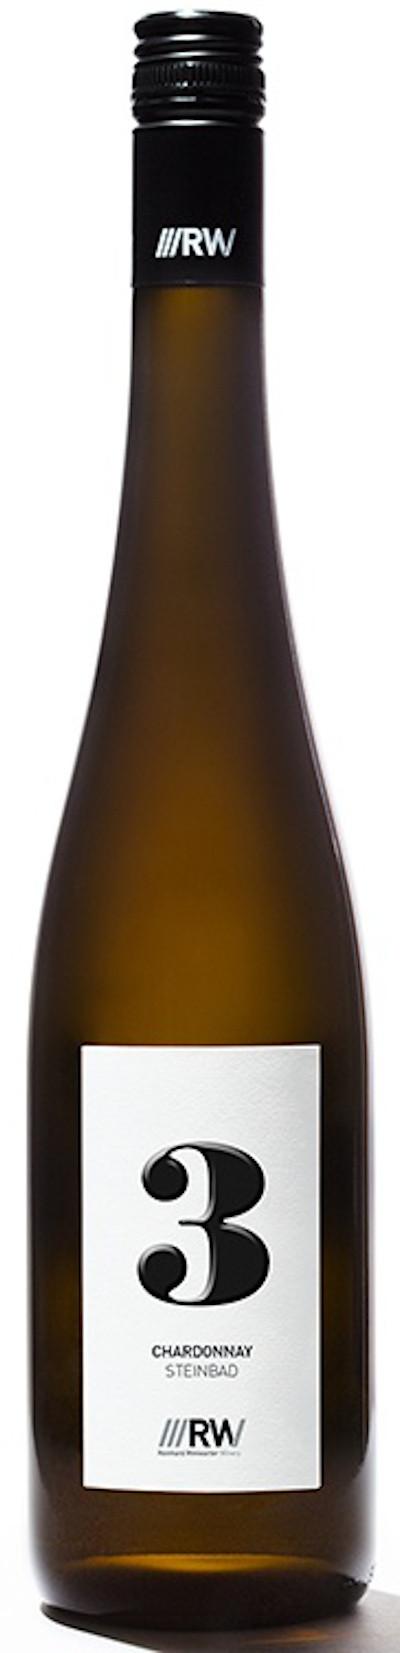 Winiwarter - Chardonnay RW3 Steinbad